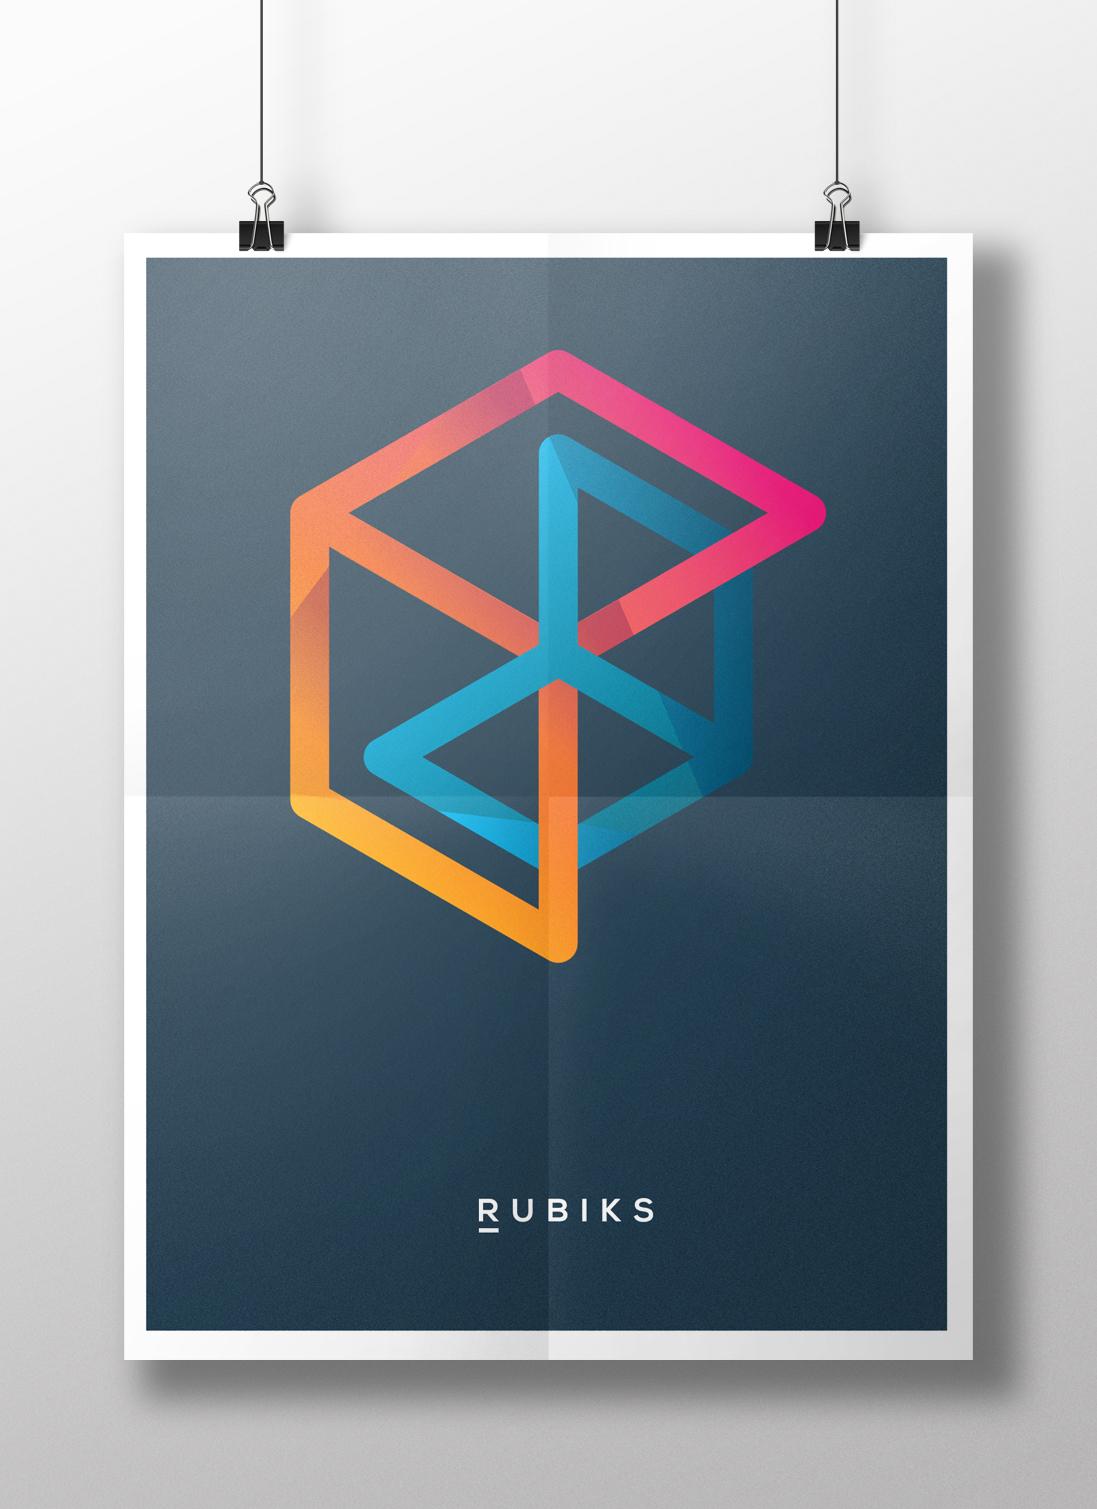 rubiks poster_mockup2